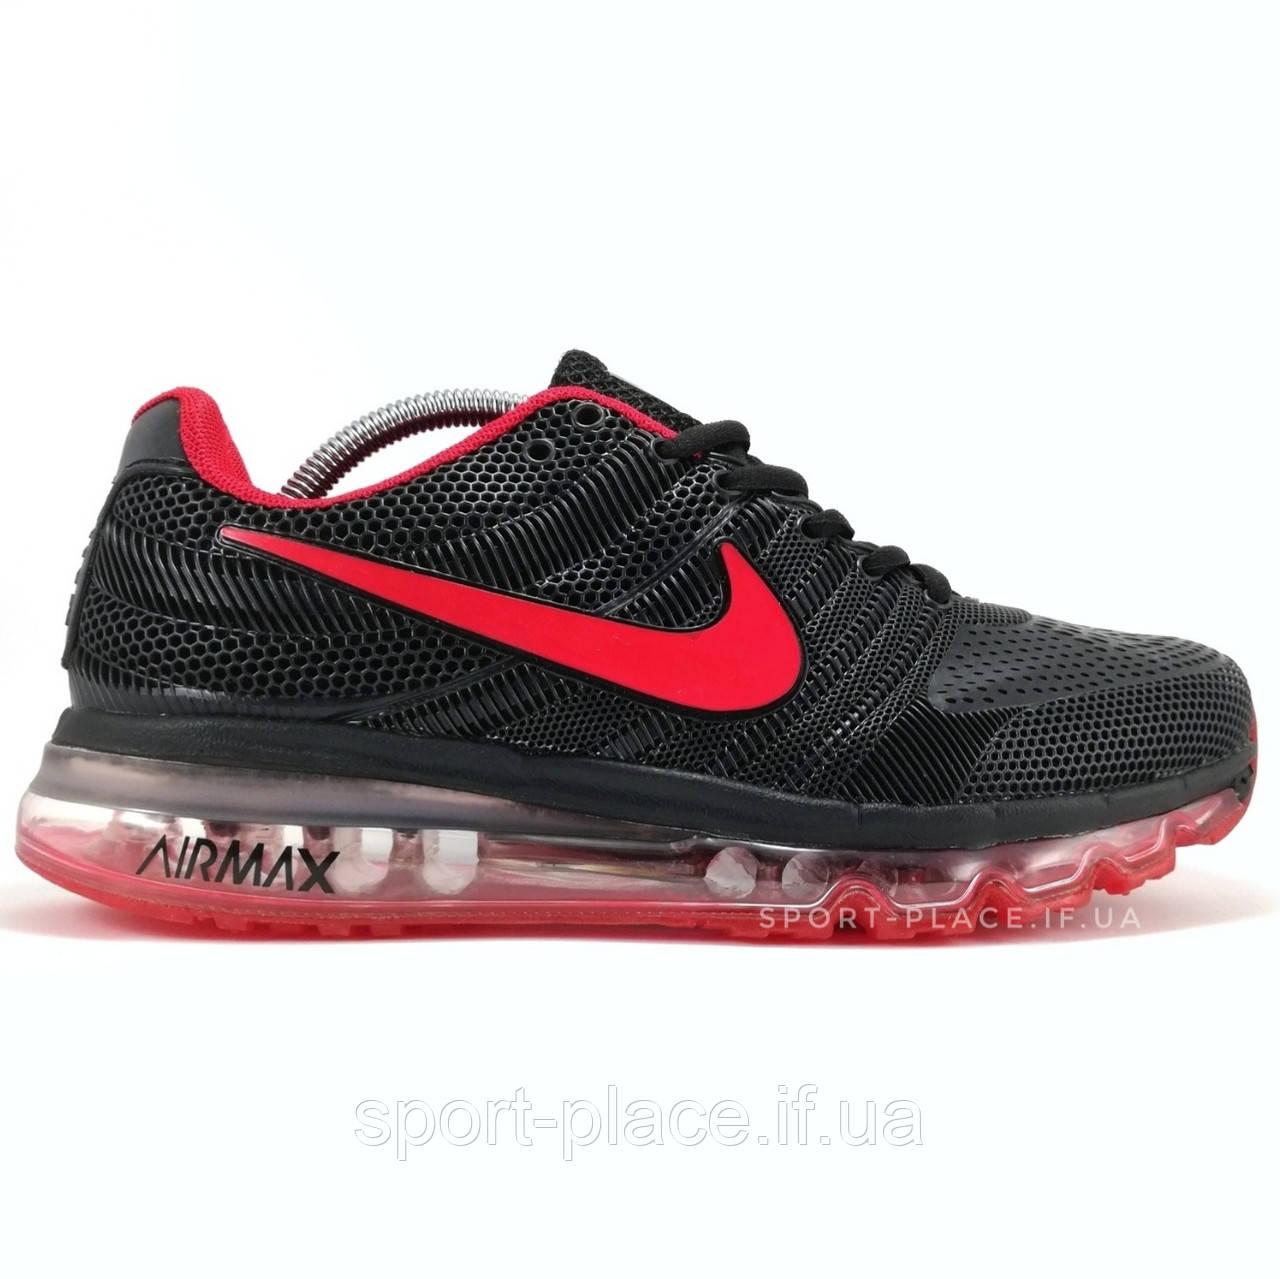 ee43143a Мужские кроссовки Nike Air Max 2017 black & red (лицензия) - Интернет  магазин кроссовок